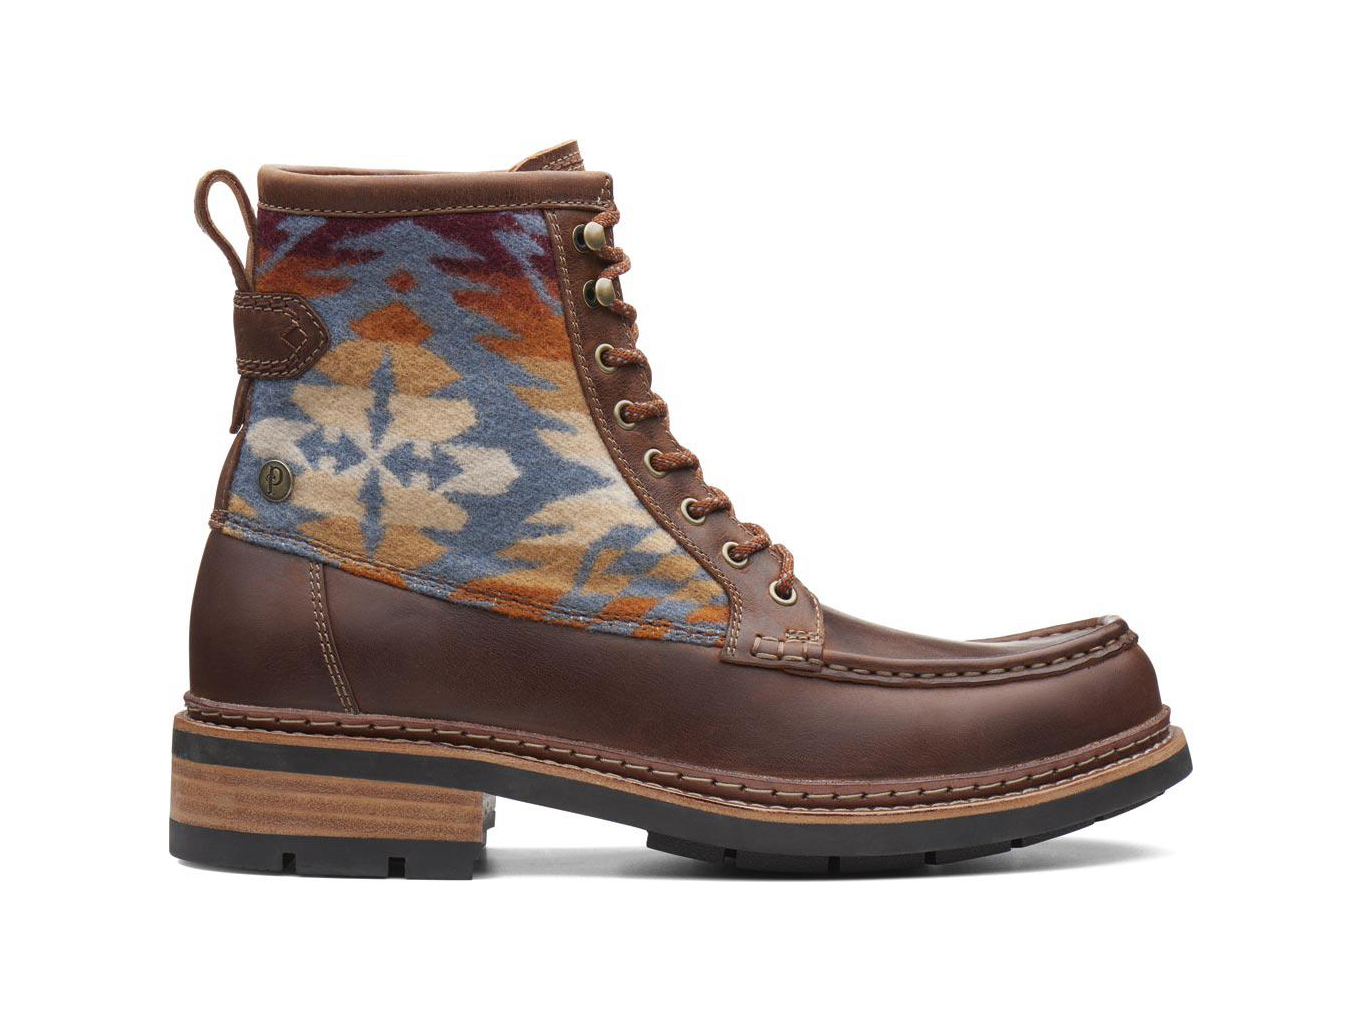 Clarks Ottawa Peak Ankle Boot